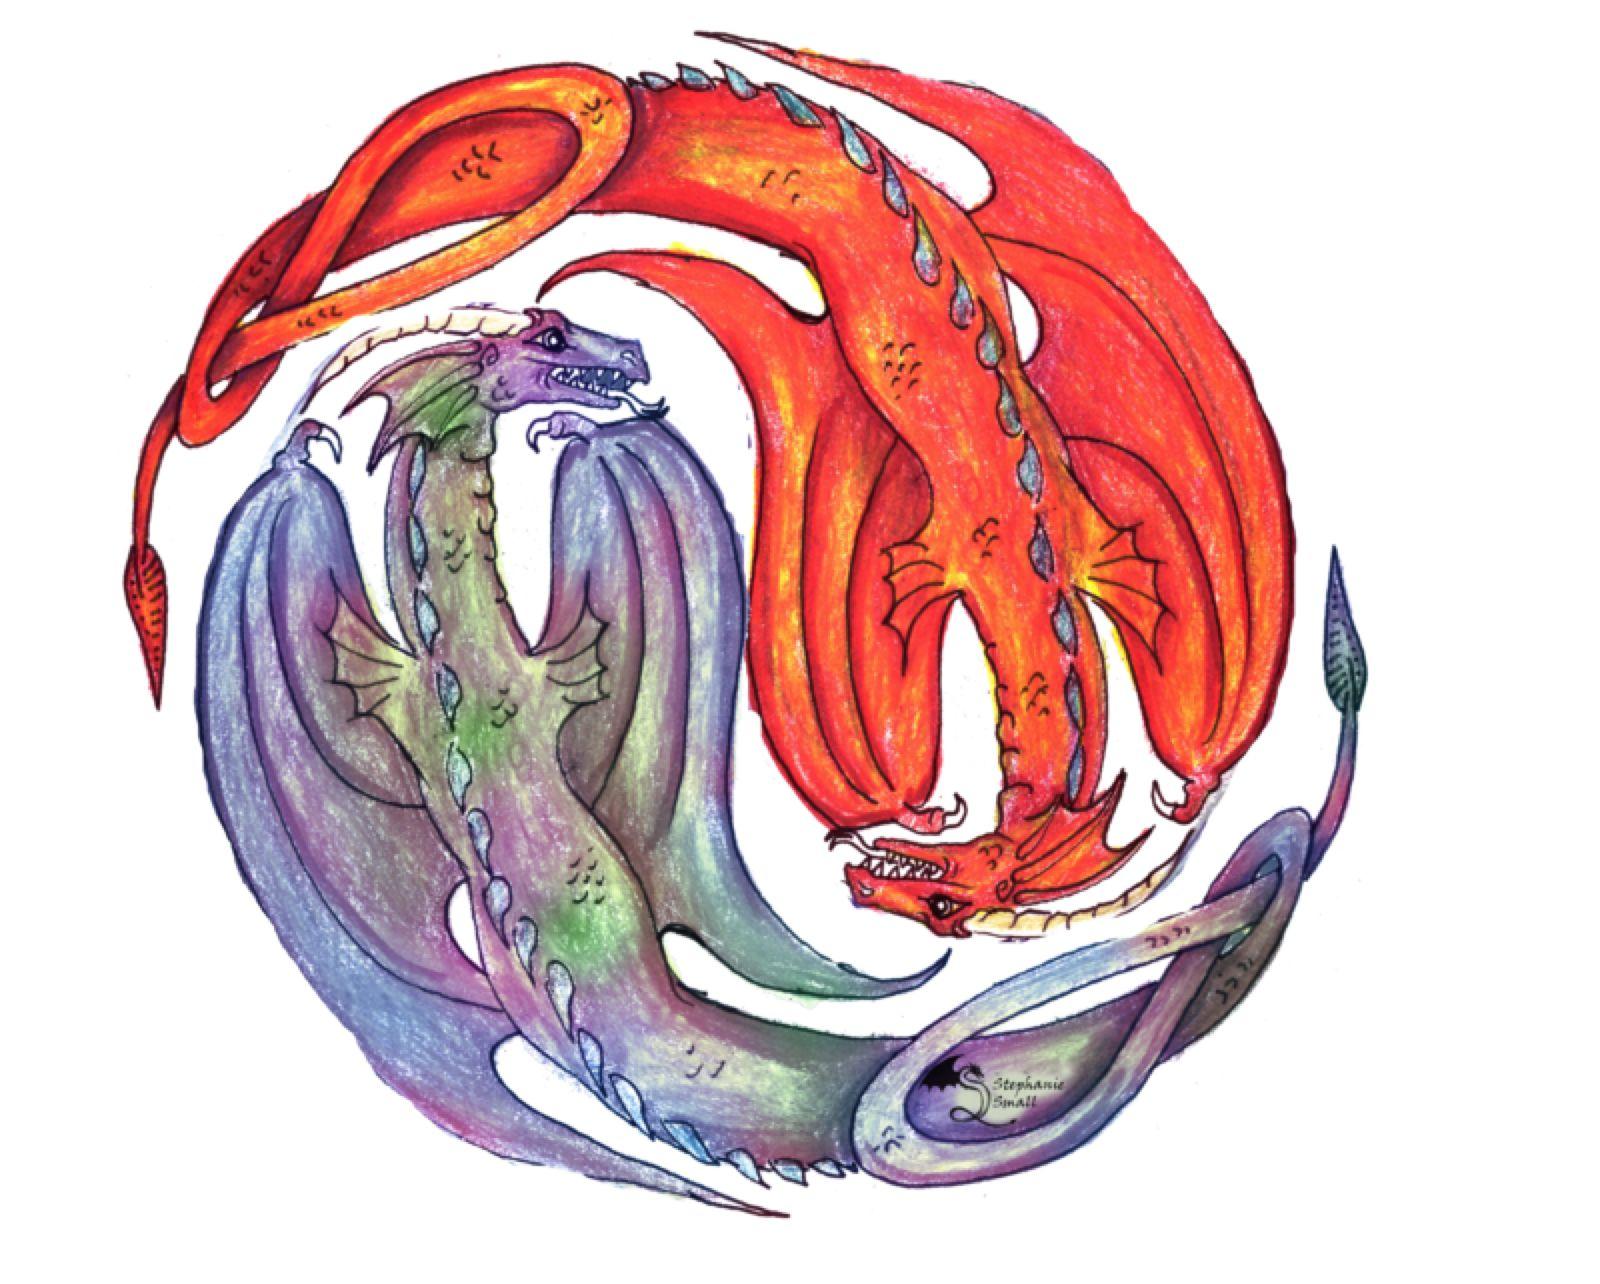 Yin Yang Dragon Fire Water Fantasy red orange yell by